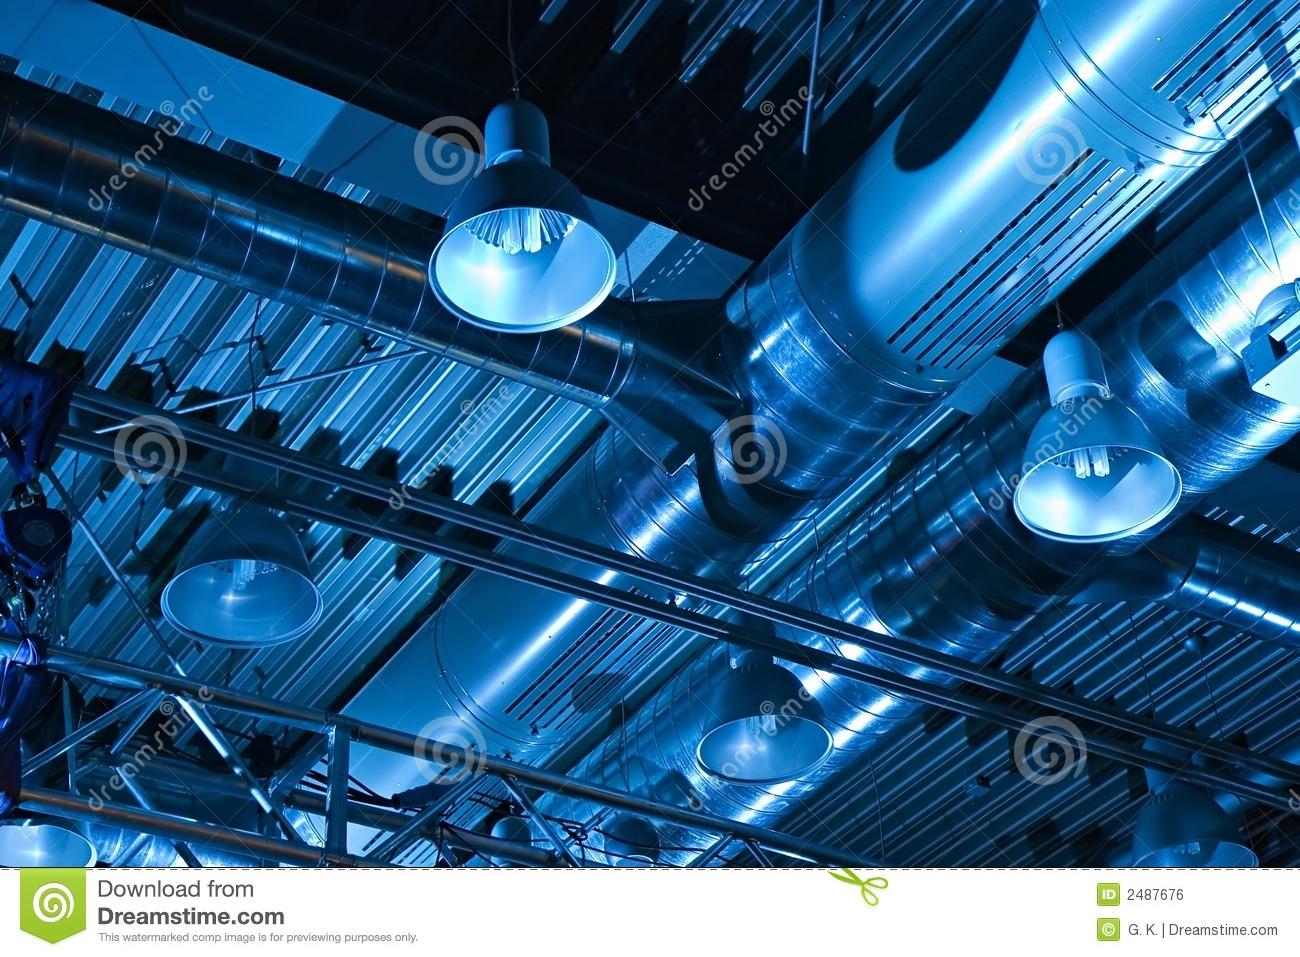 Ventilation System Royalty Free Stock Image.